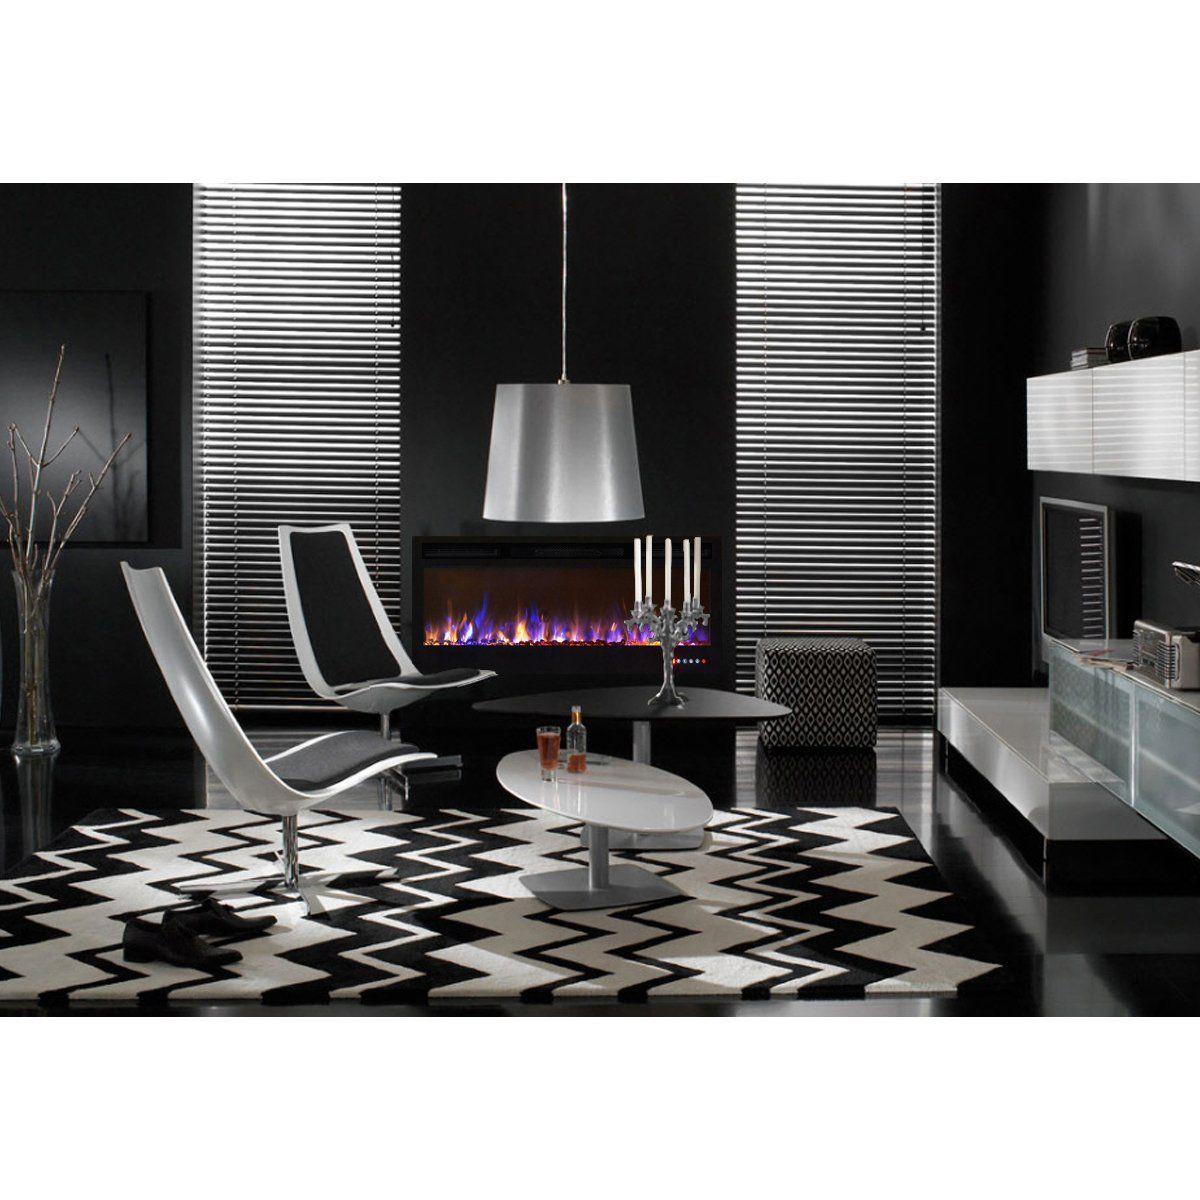 30 Black White Living Rooms That Work Their Monochrome Magic: Regal Flame Lexington 35 MultiColor Builtin Ventless